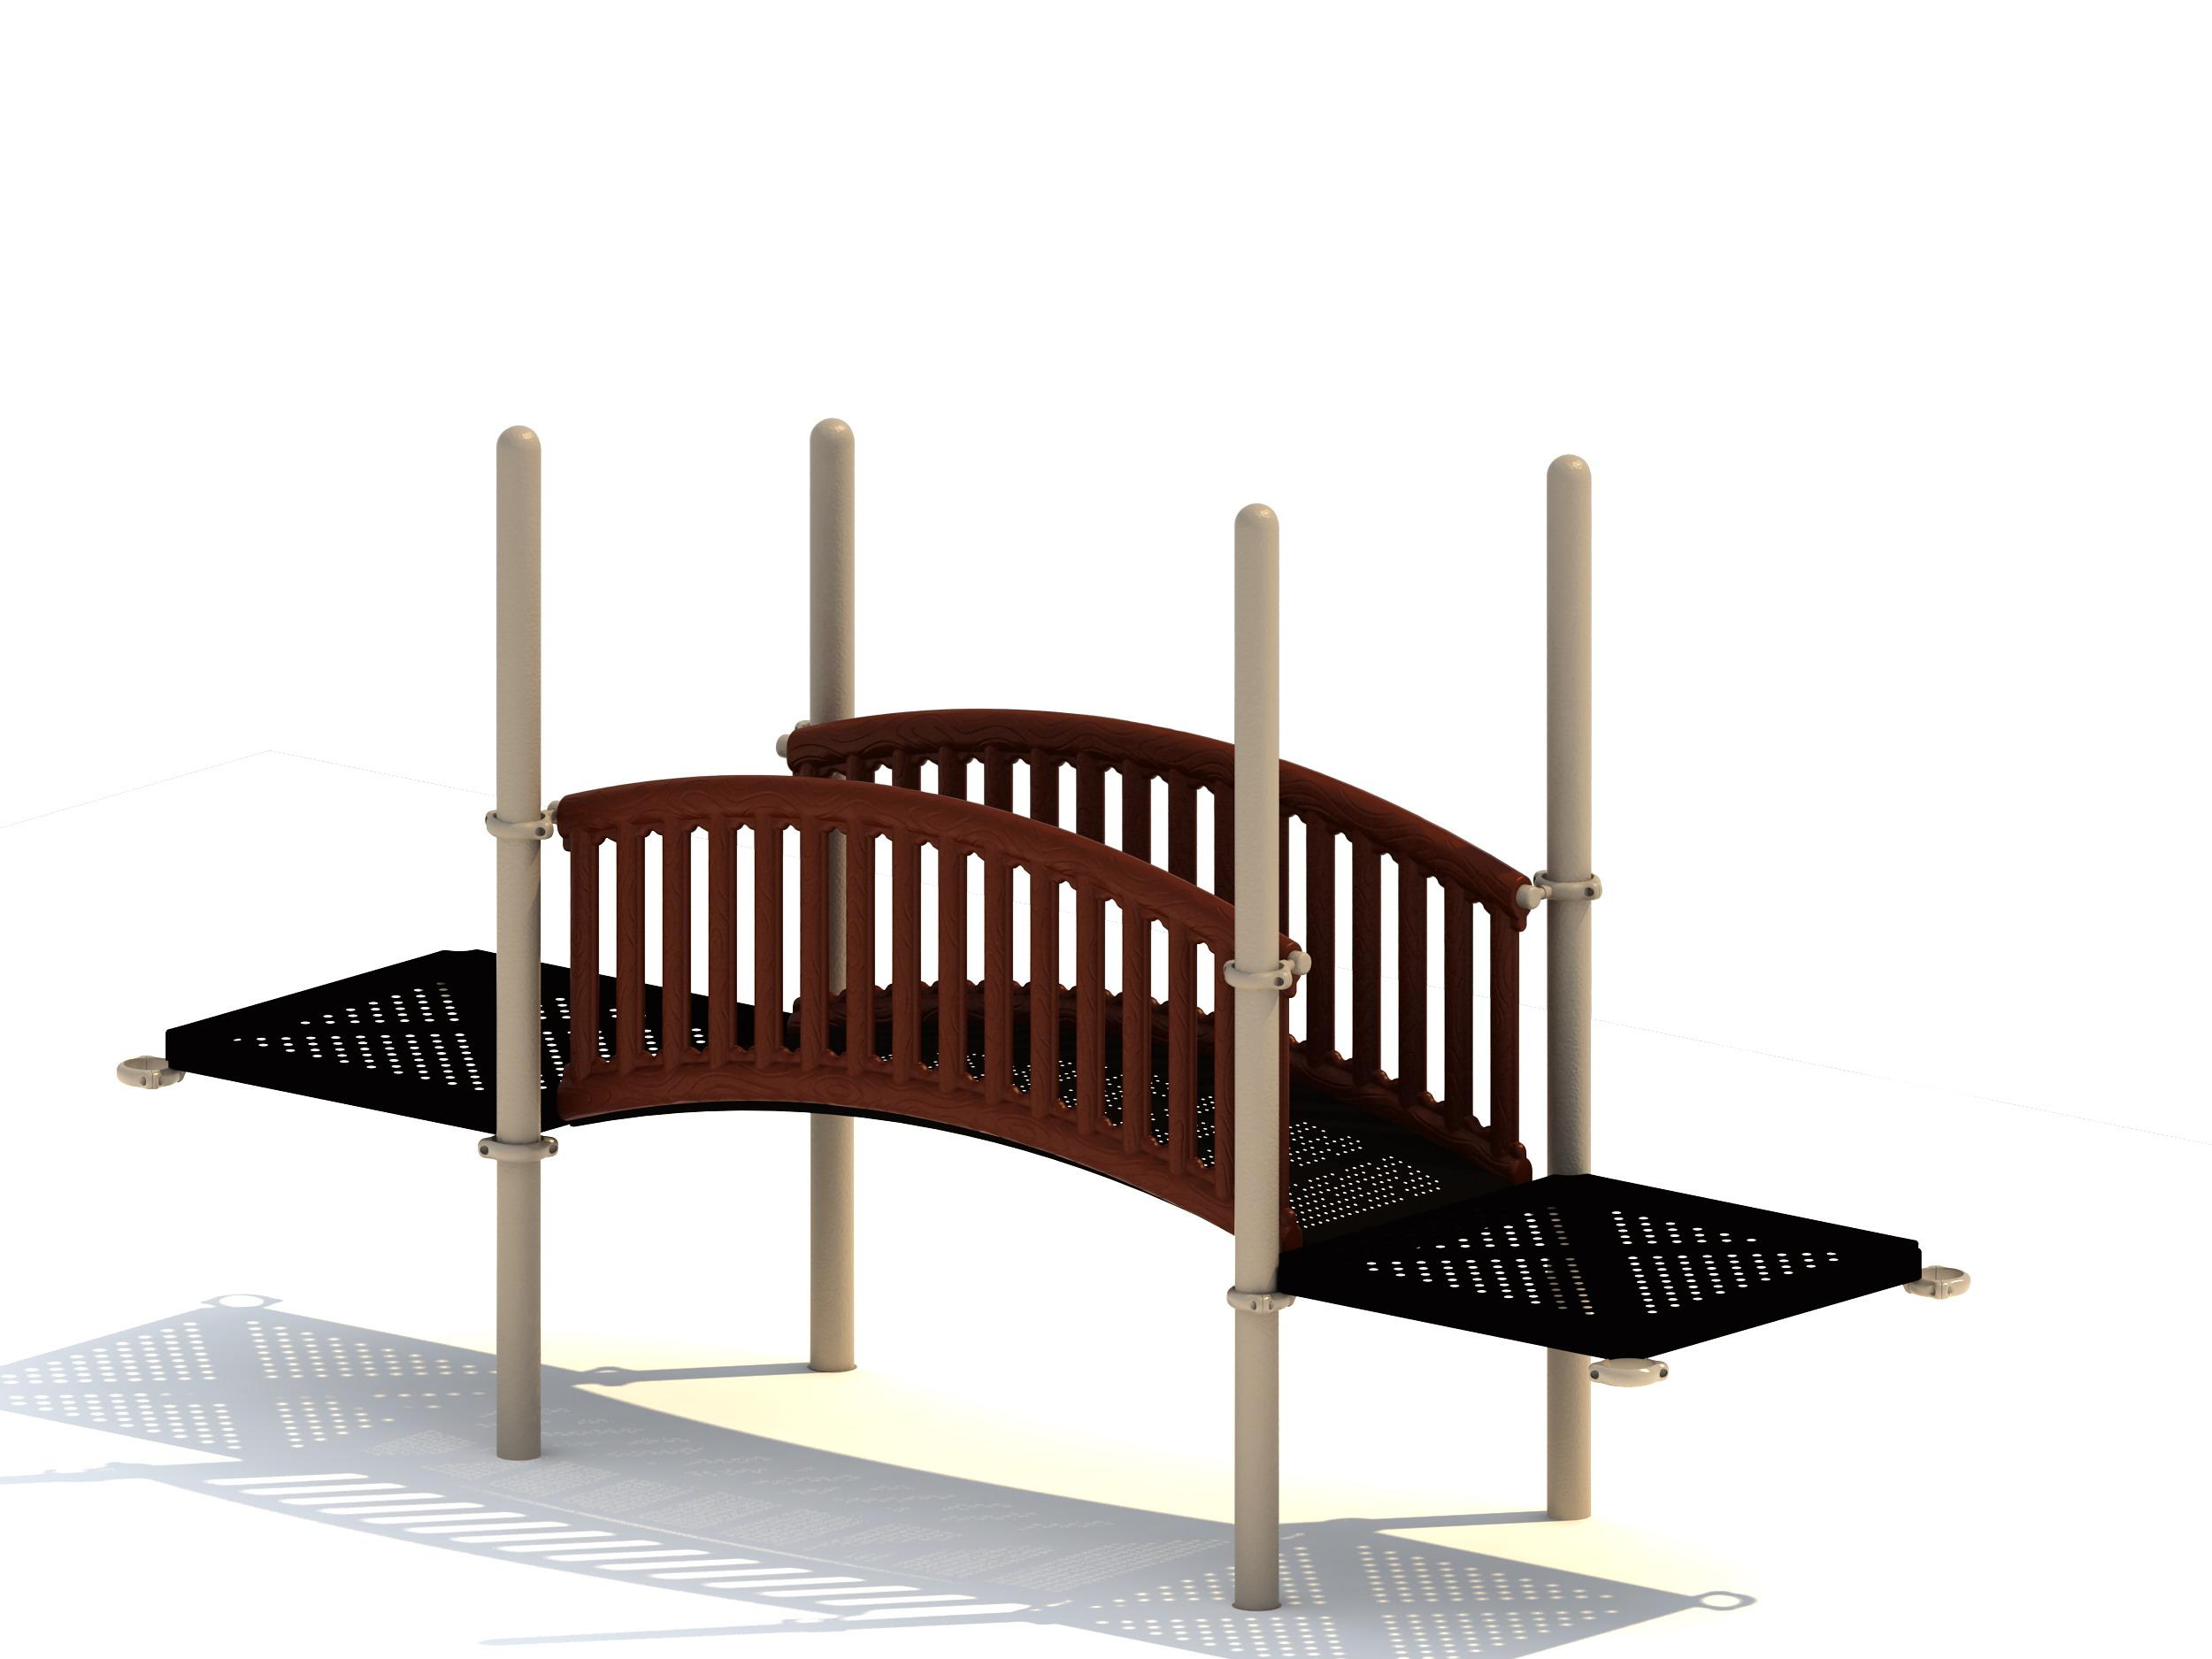 arch-bridge-plastic-handrail